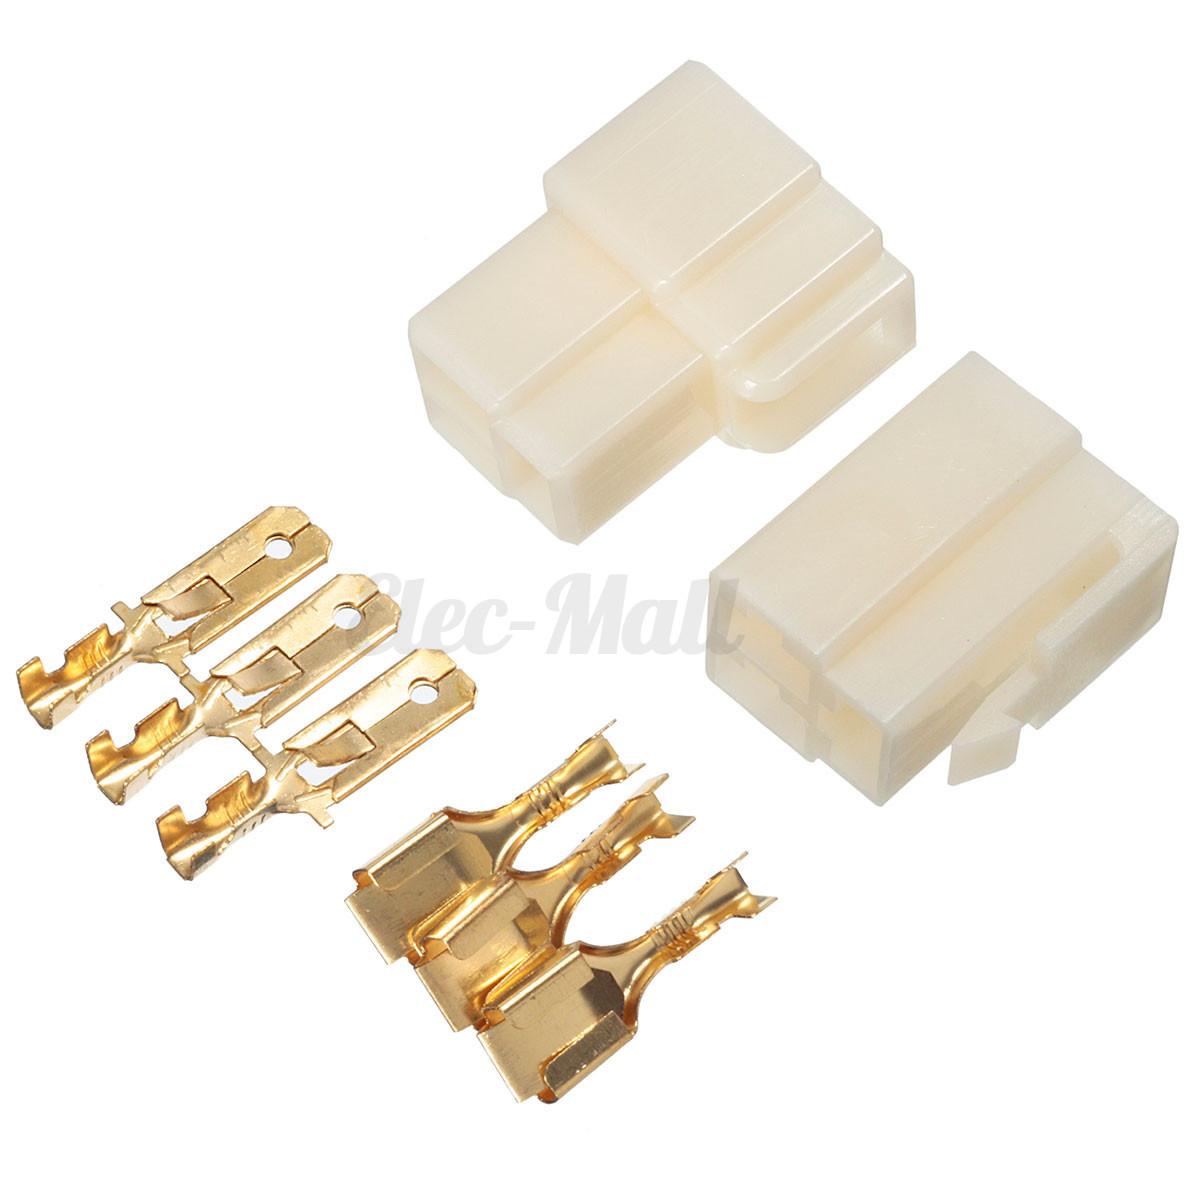 1 2 Pcs 1 8 Way Pin 6 3mm Car Electrical Block Multi